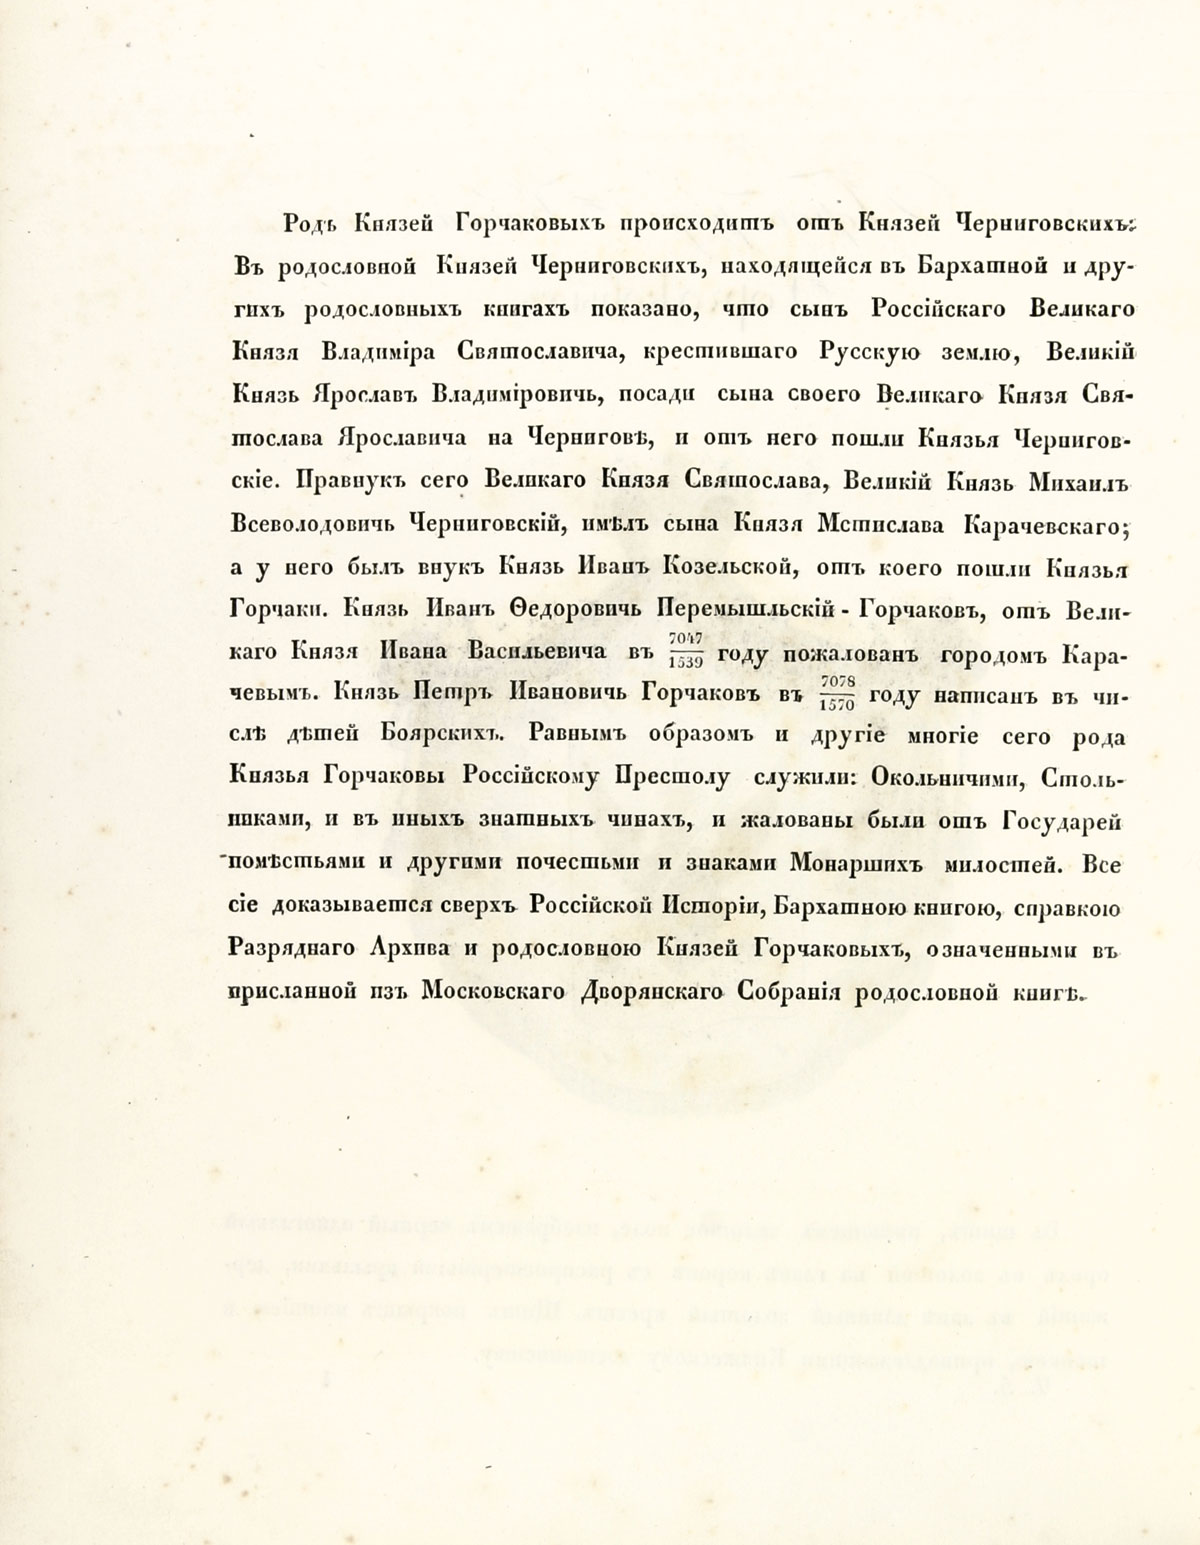 Герб рода князей Горчаковых, стр. 2